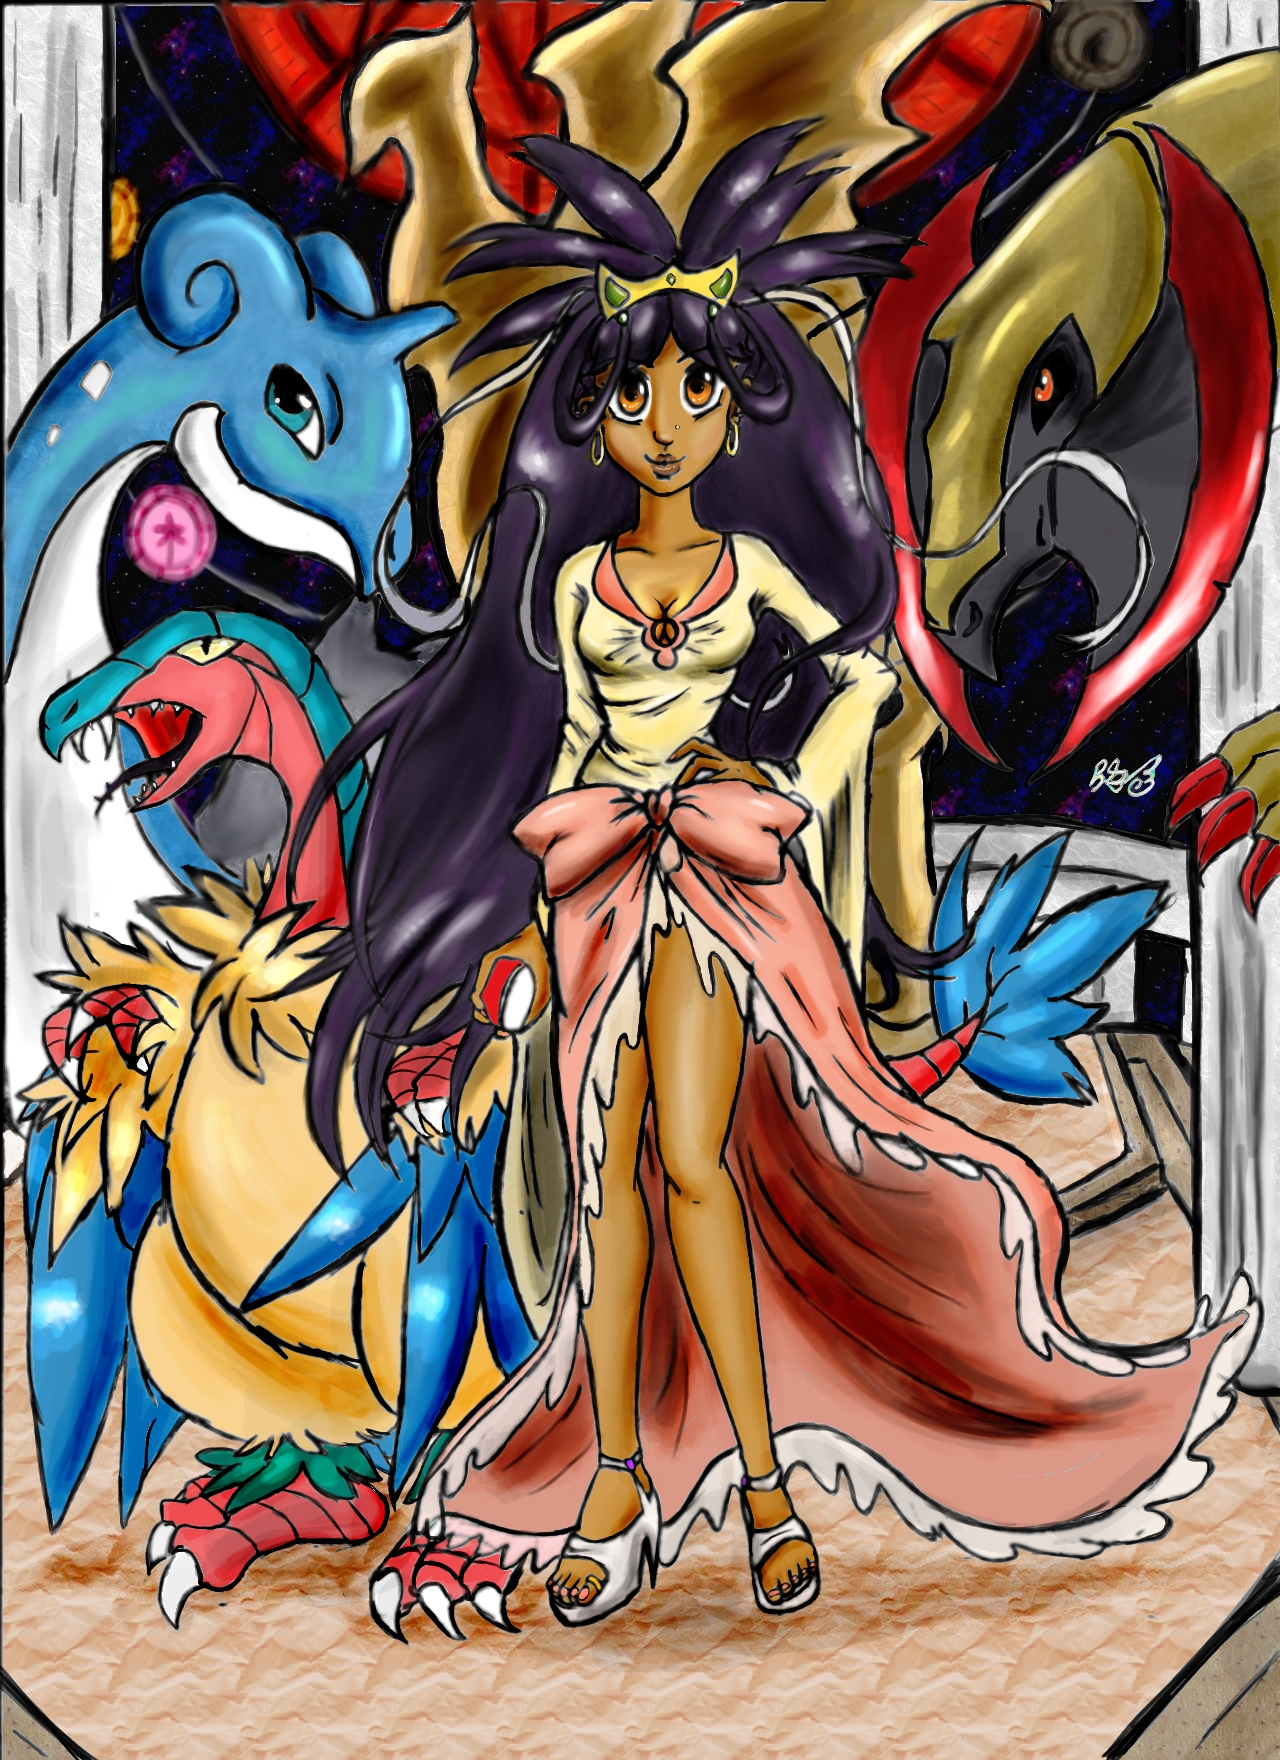 Pokemon Iris Champion Images | Pokemon Images